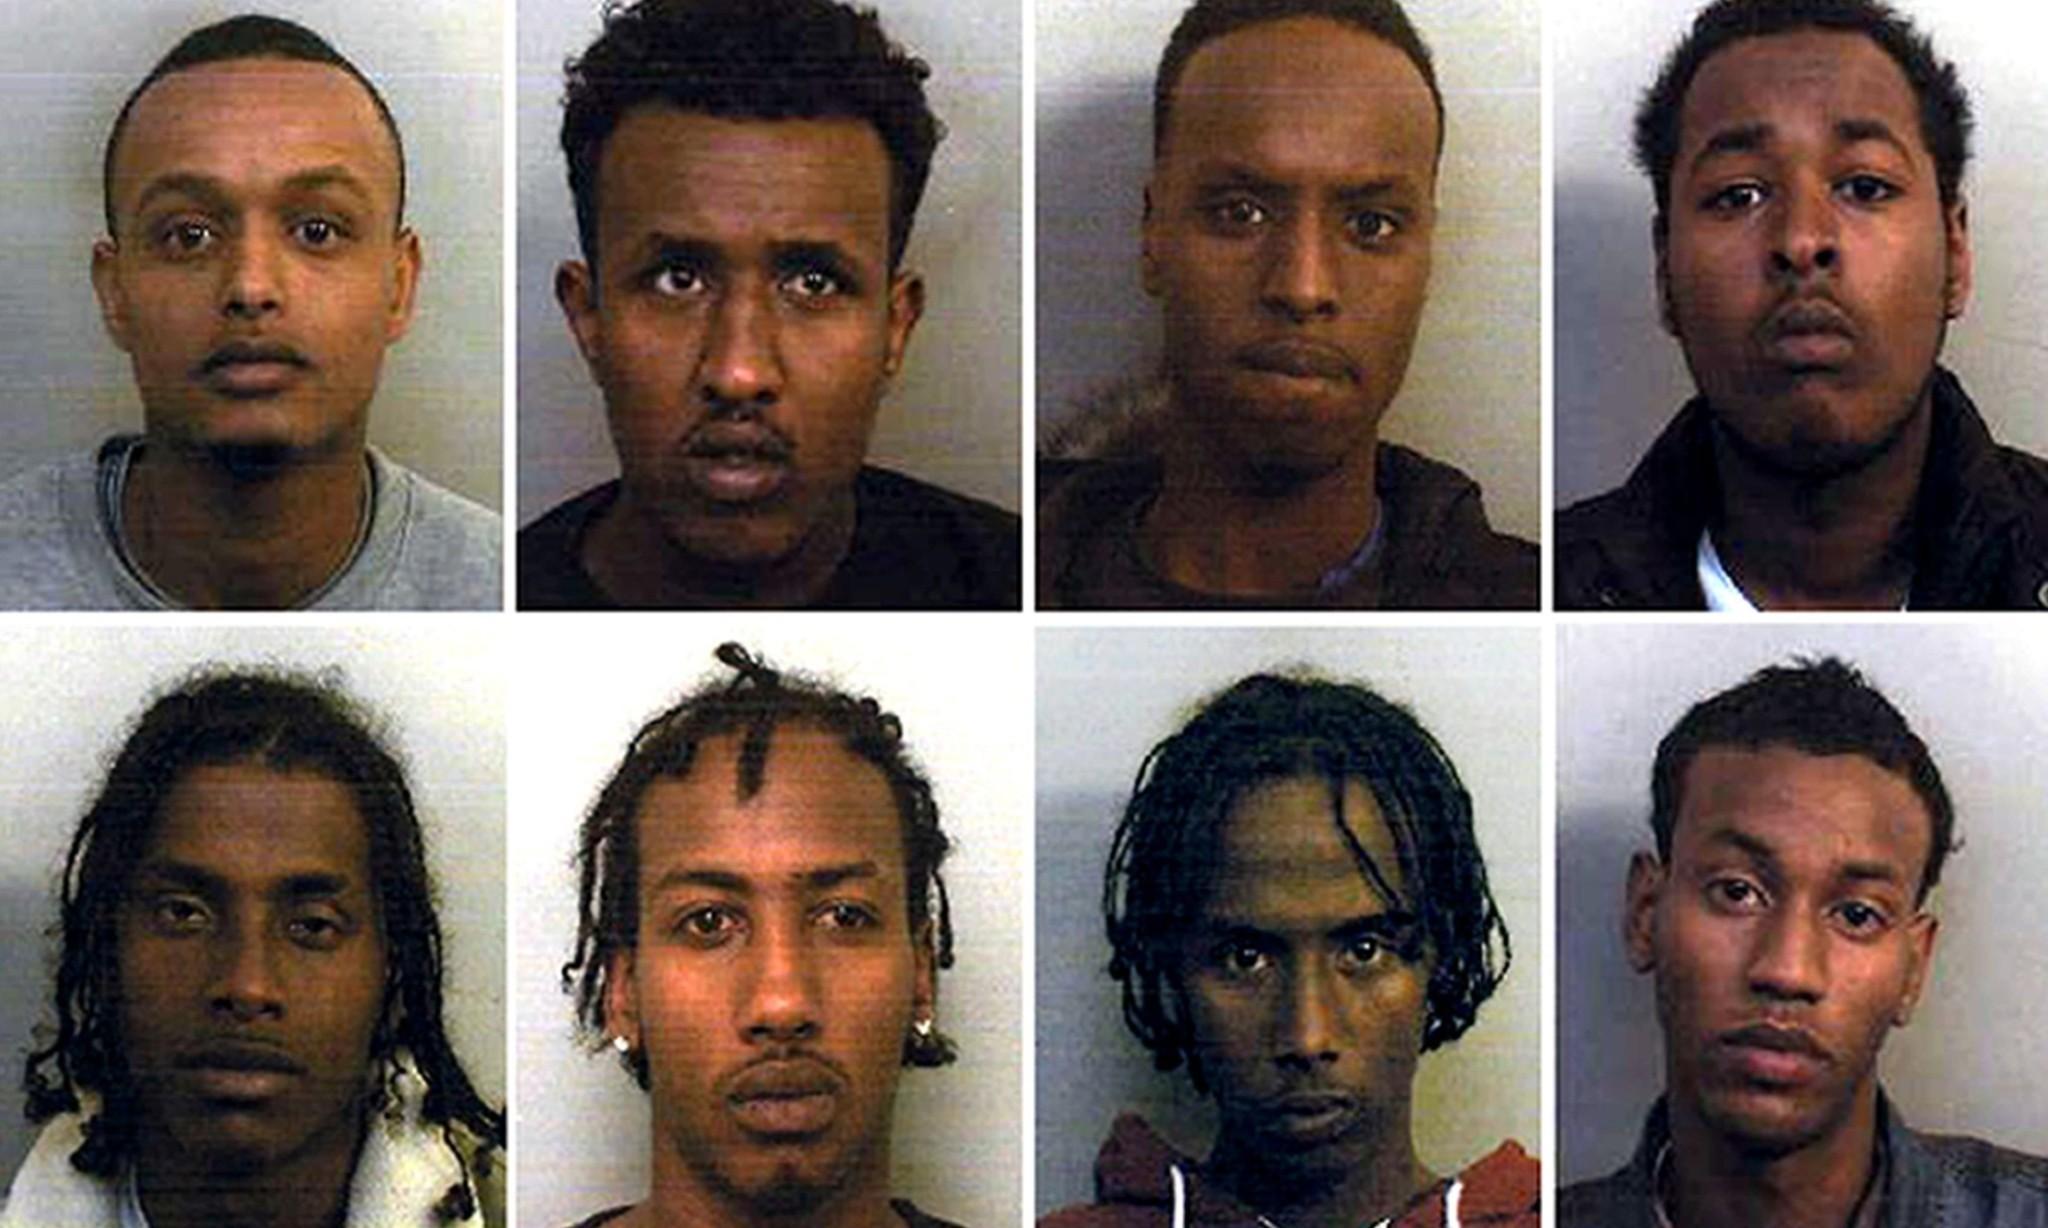 13 men guilty of enforced prostitution and rape of vulnerable girls in Bristol